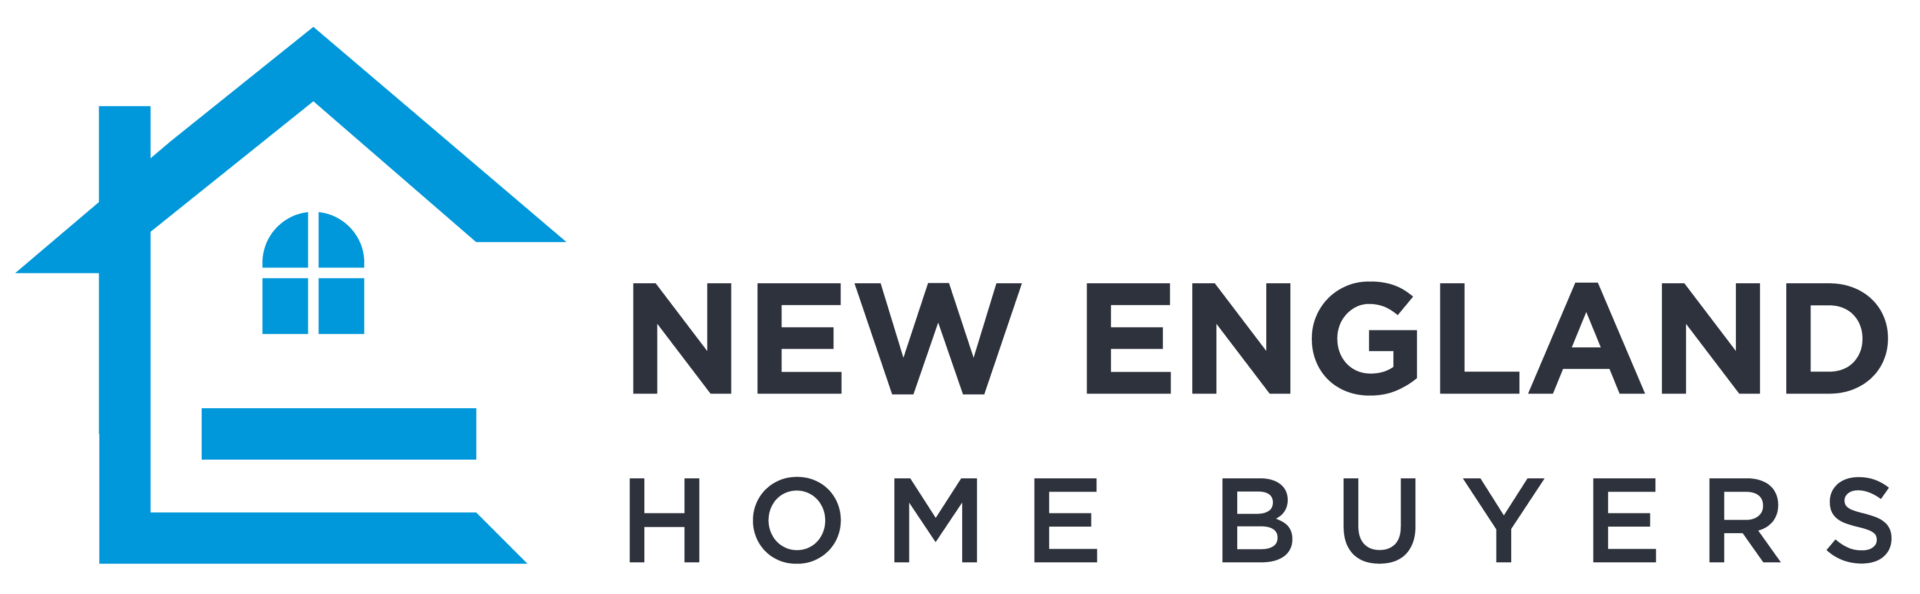 New England Home Buyers | We Buy Houses Here logo